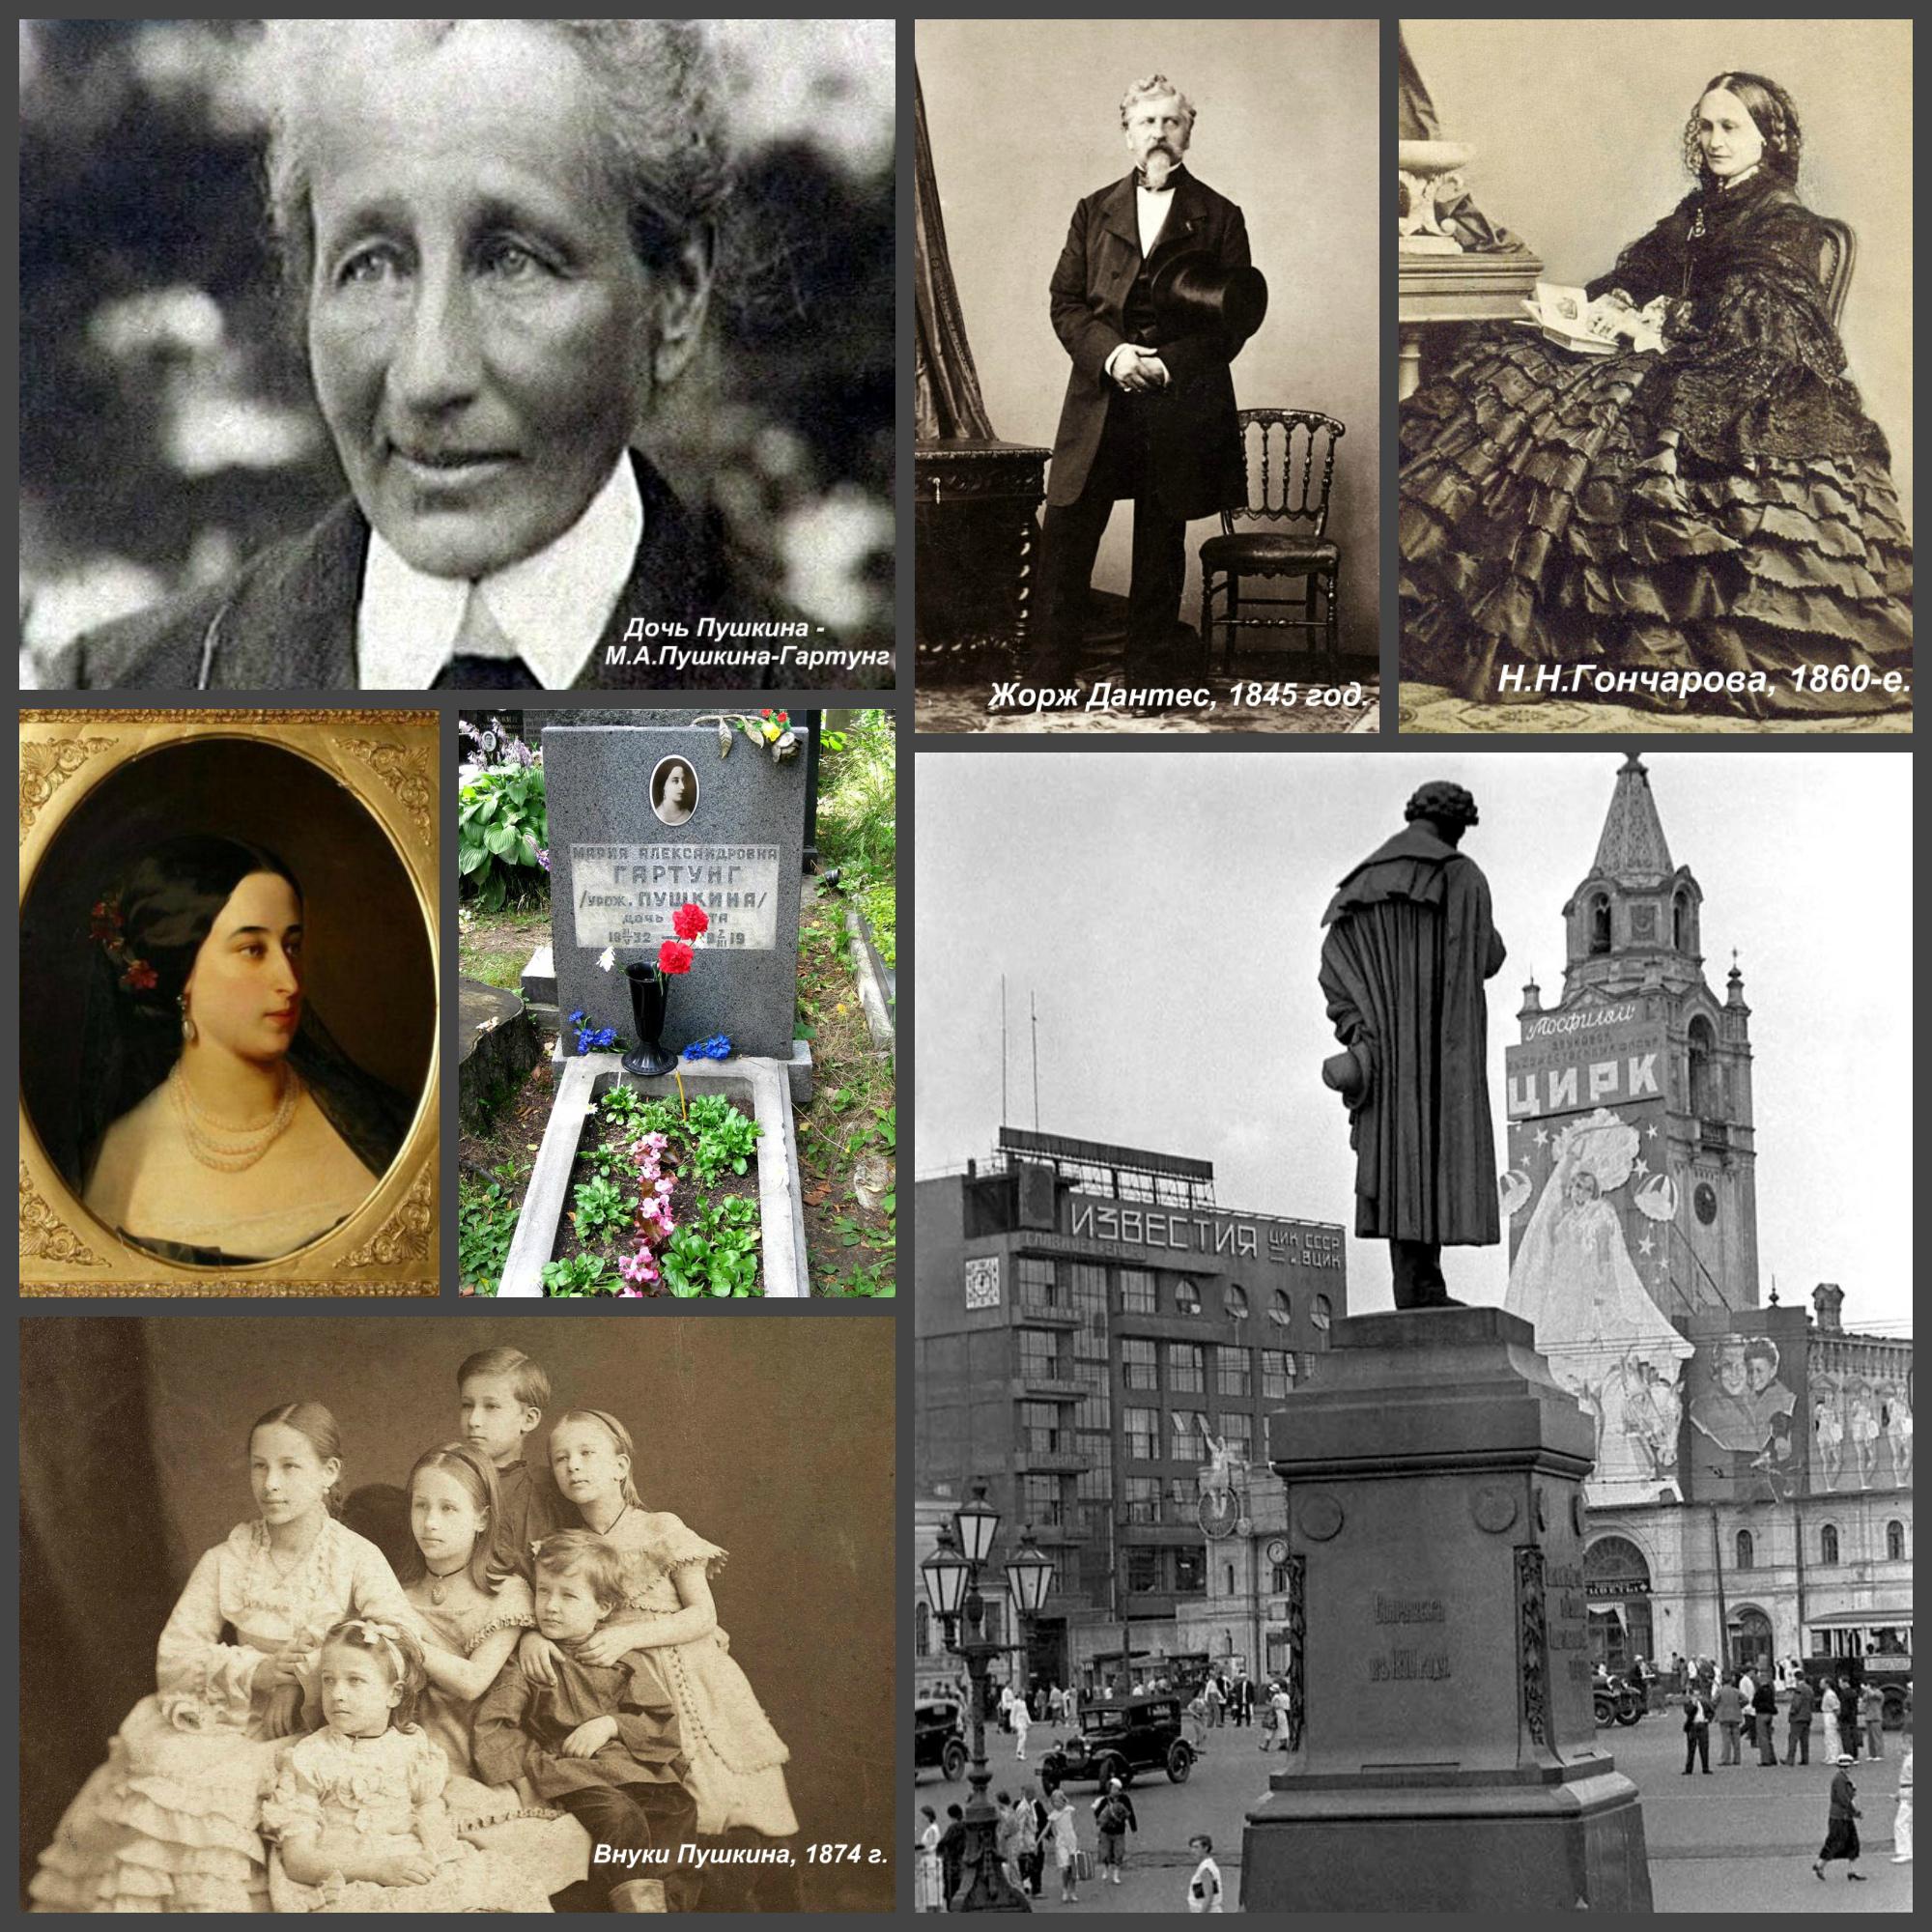 Дочь Пушкина – любимица Мария